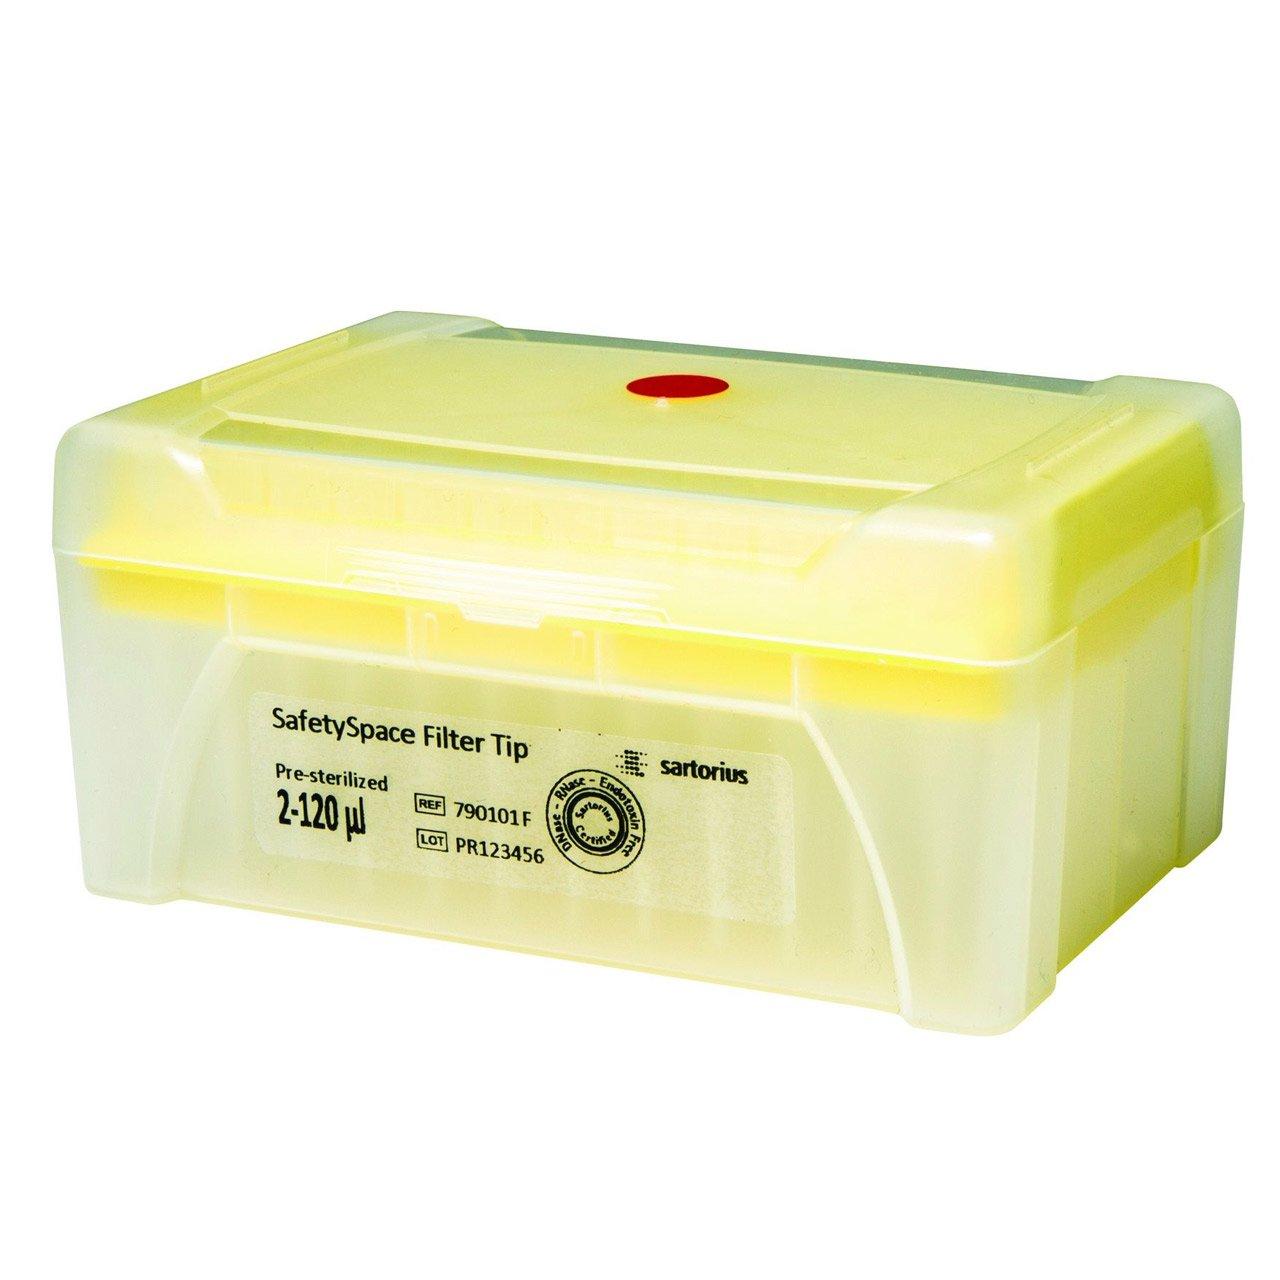 SafetySpace Filter Tip, 2-120 µl, Sterile (10x96)